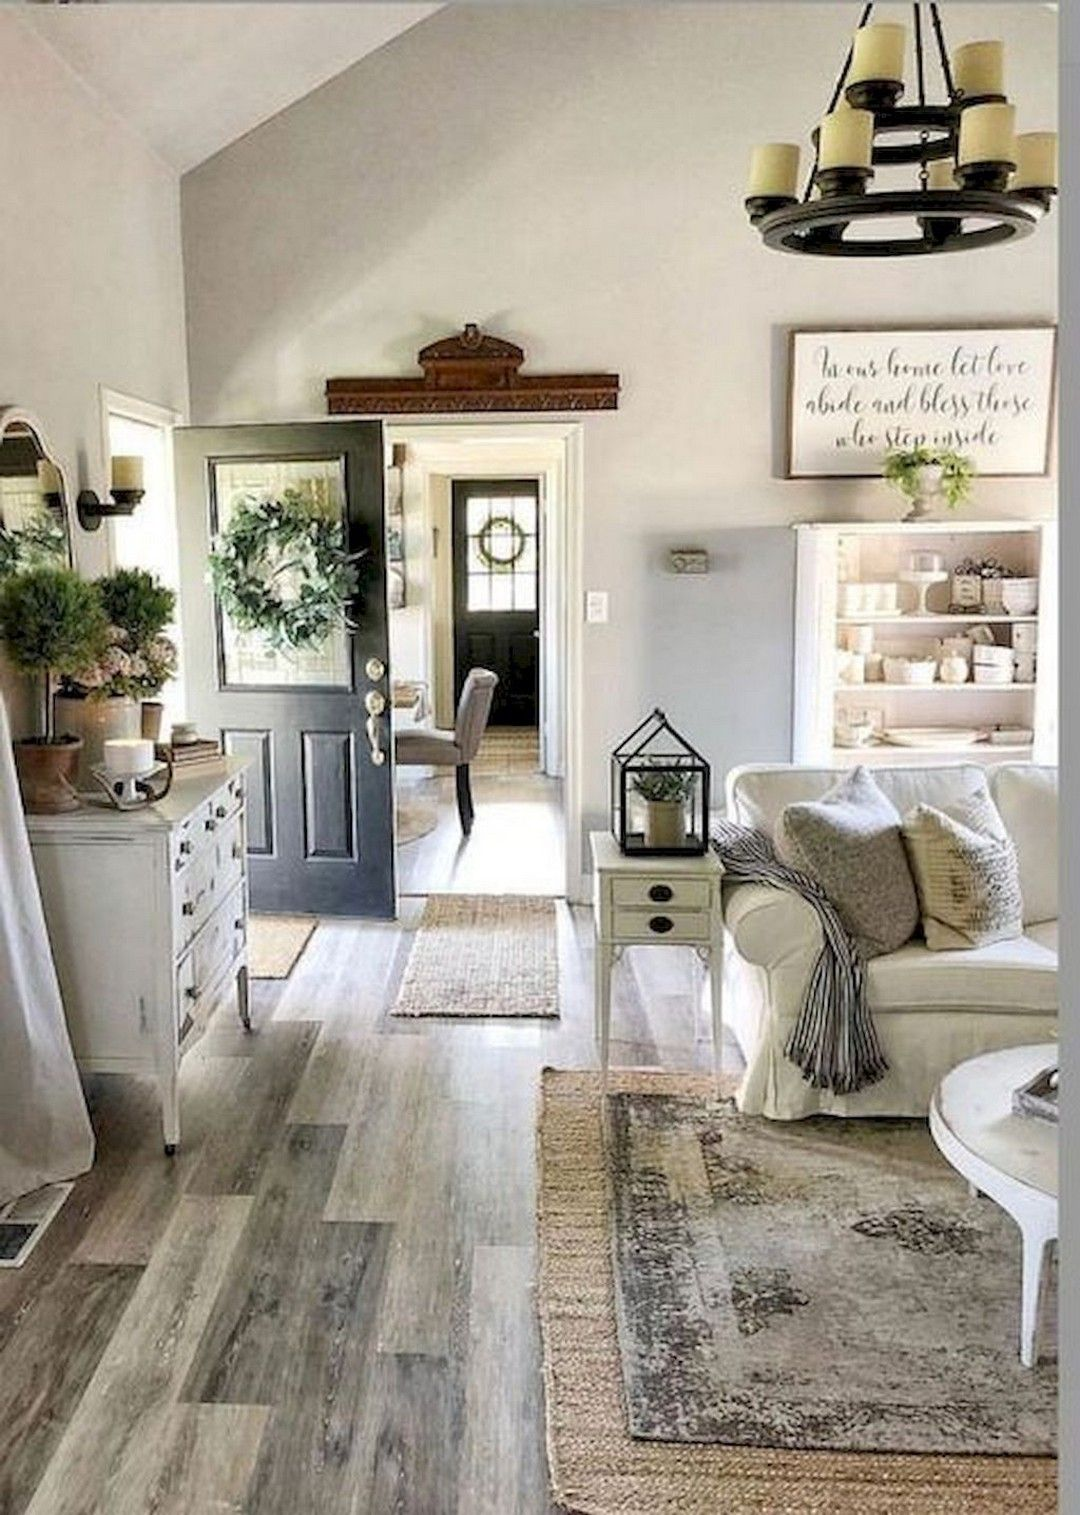 27 Amazing Rustic Farmhouse Style Living Room Design Ideas images